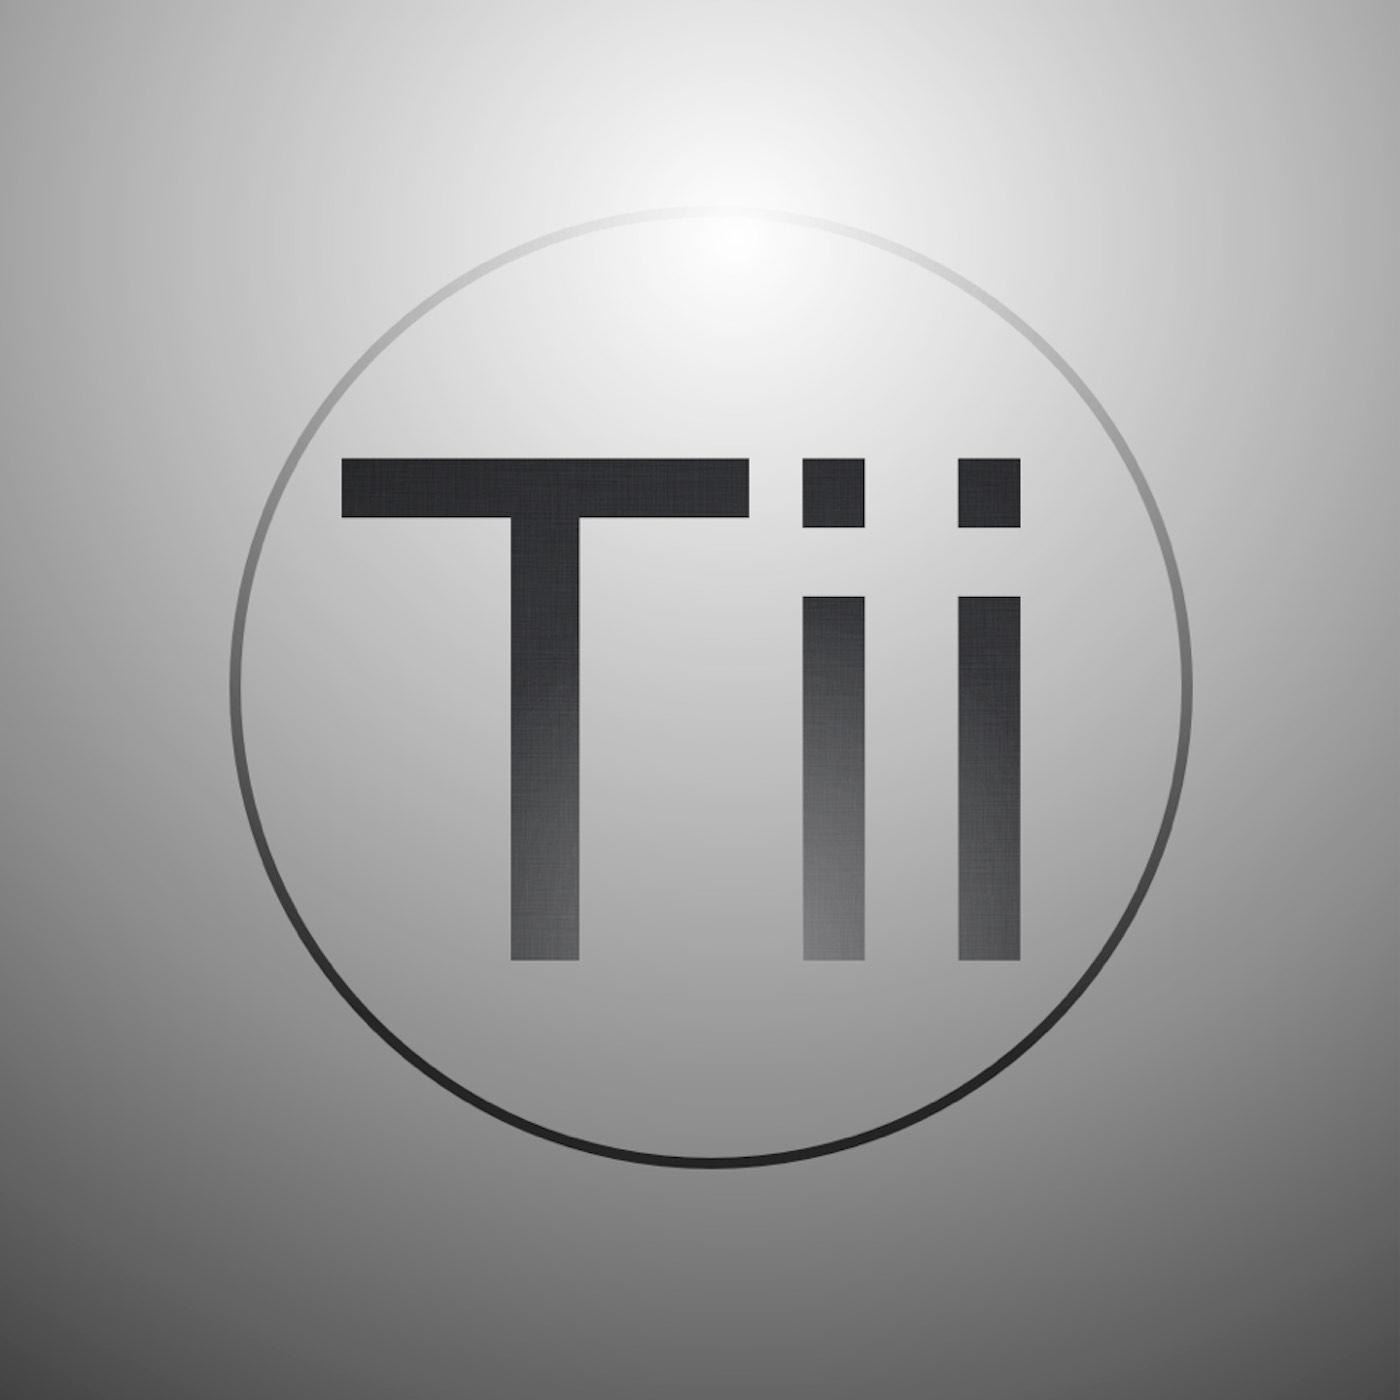 Tii 0498 - iOS 14  and 13.7 Betas, iOS 13.6 Gold Master plus Epic v Apple